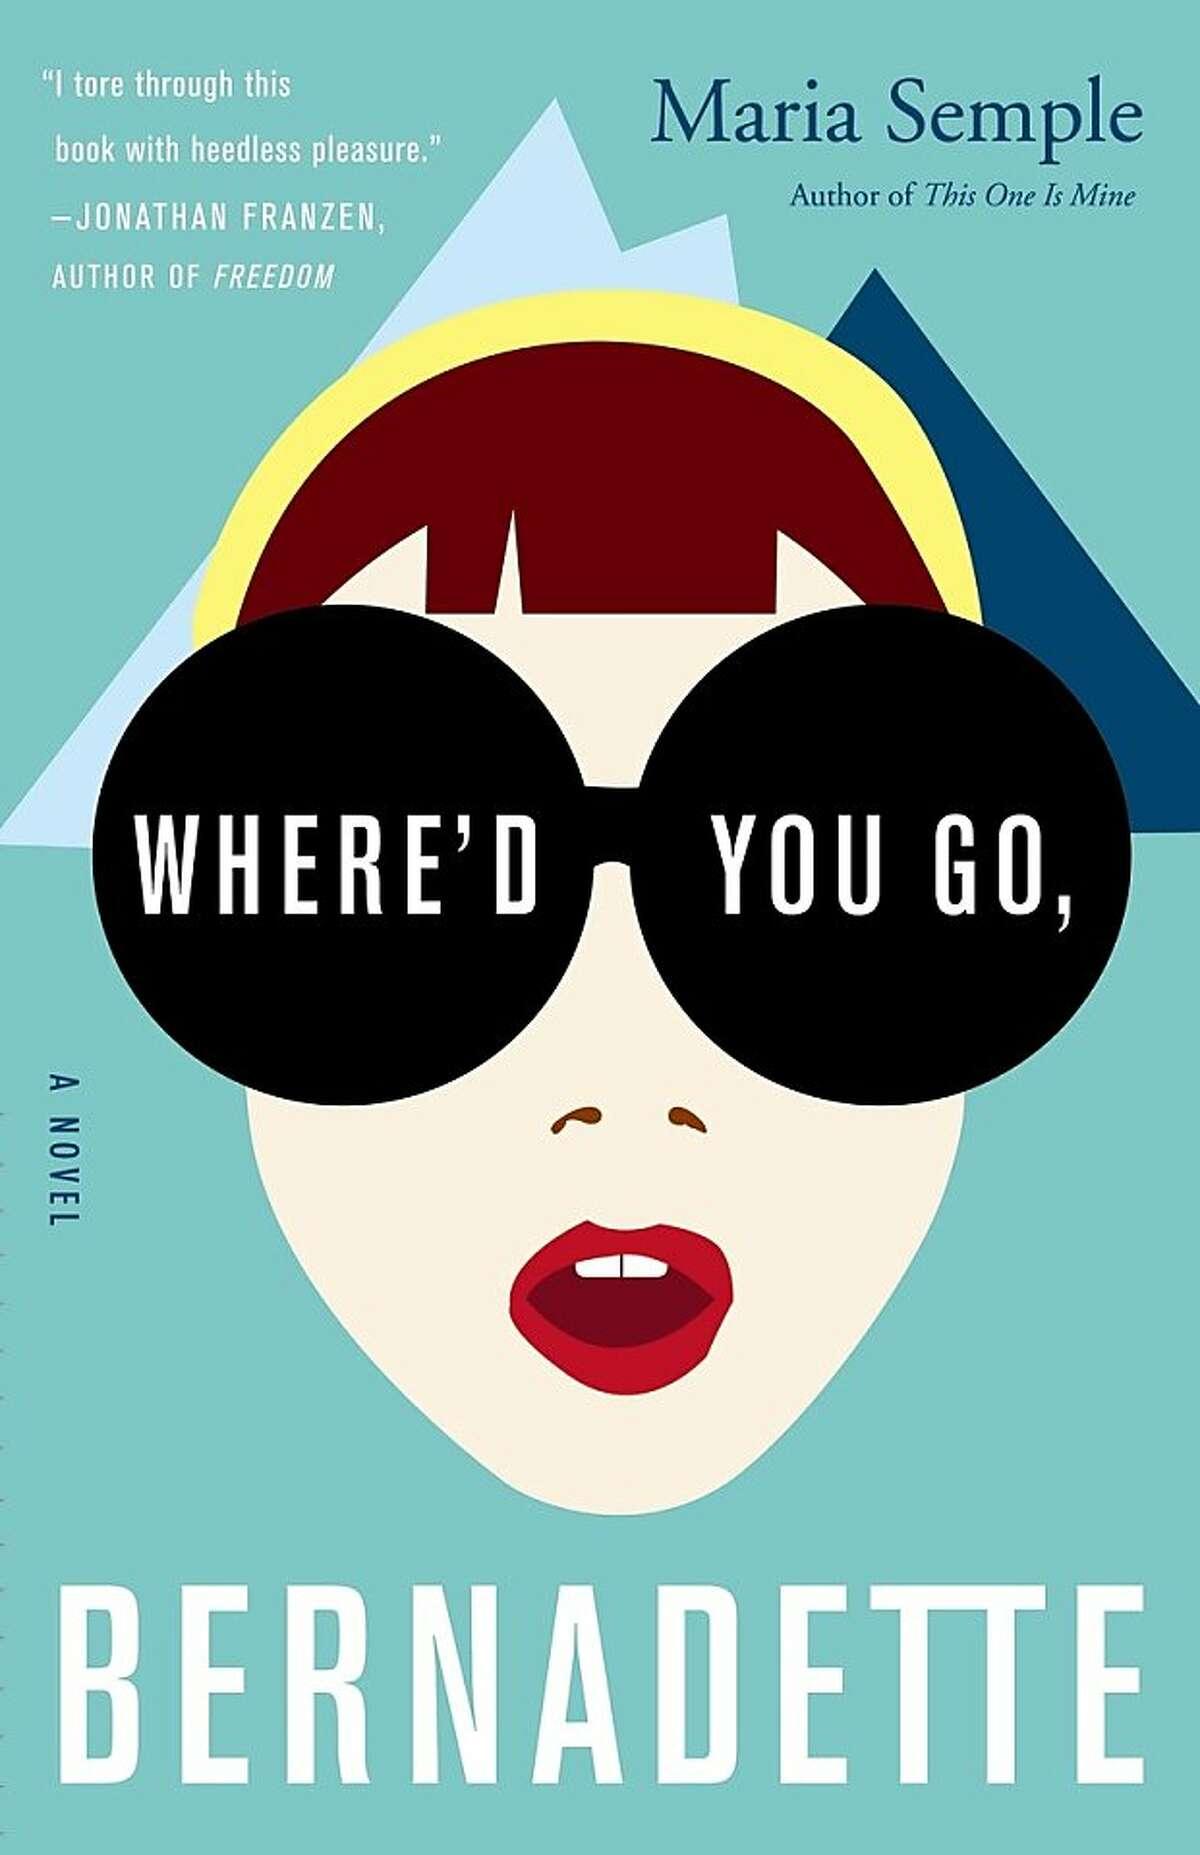 Where'd You Go, Bernadete?, by Maria Semple